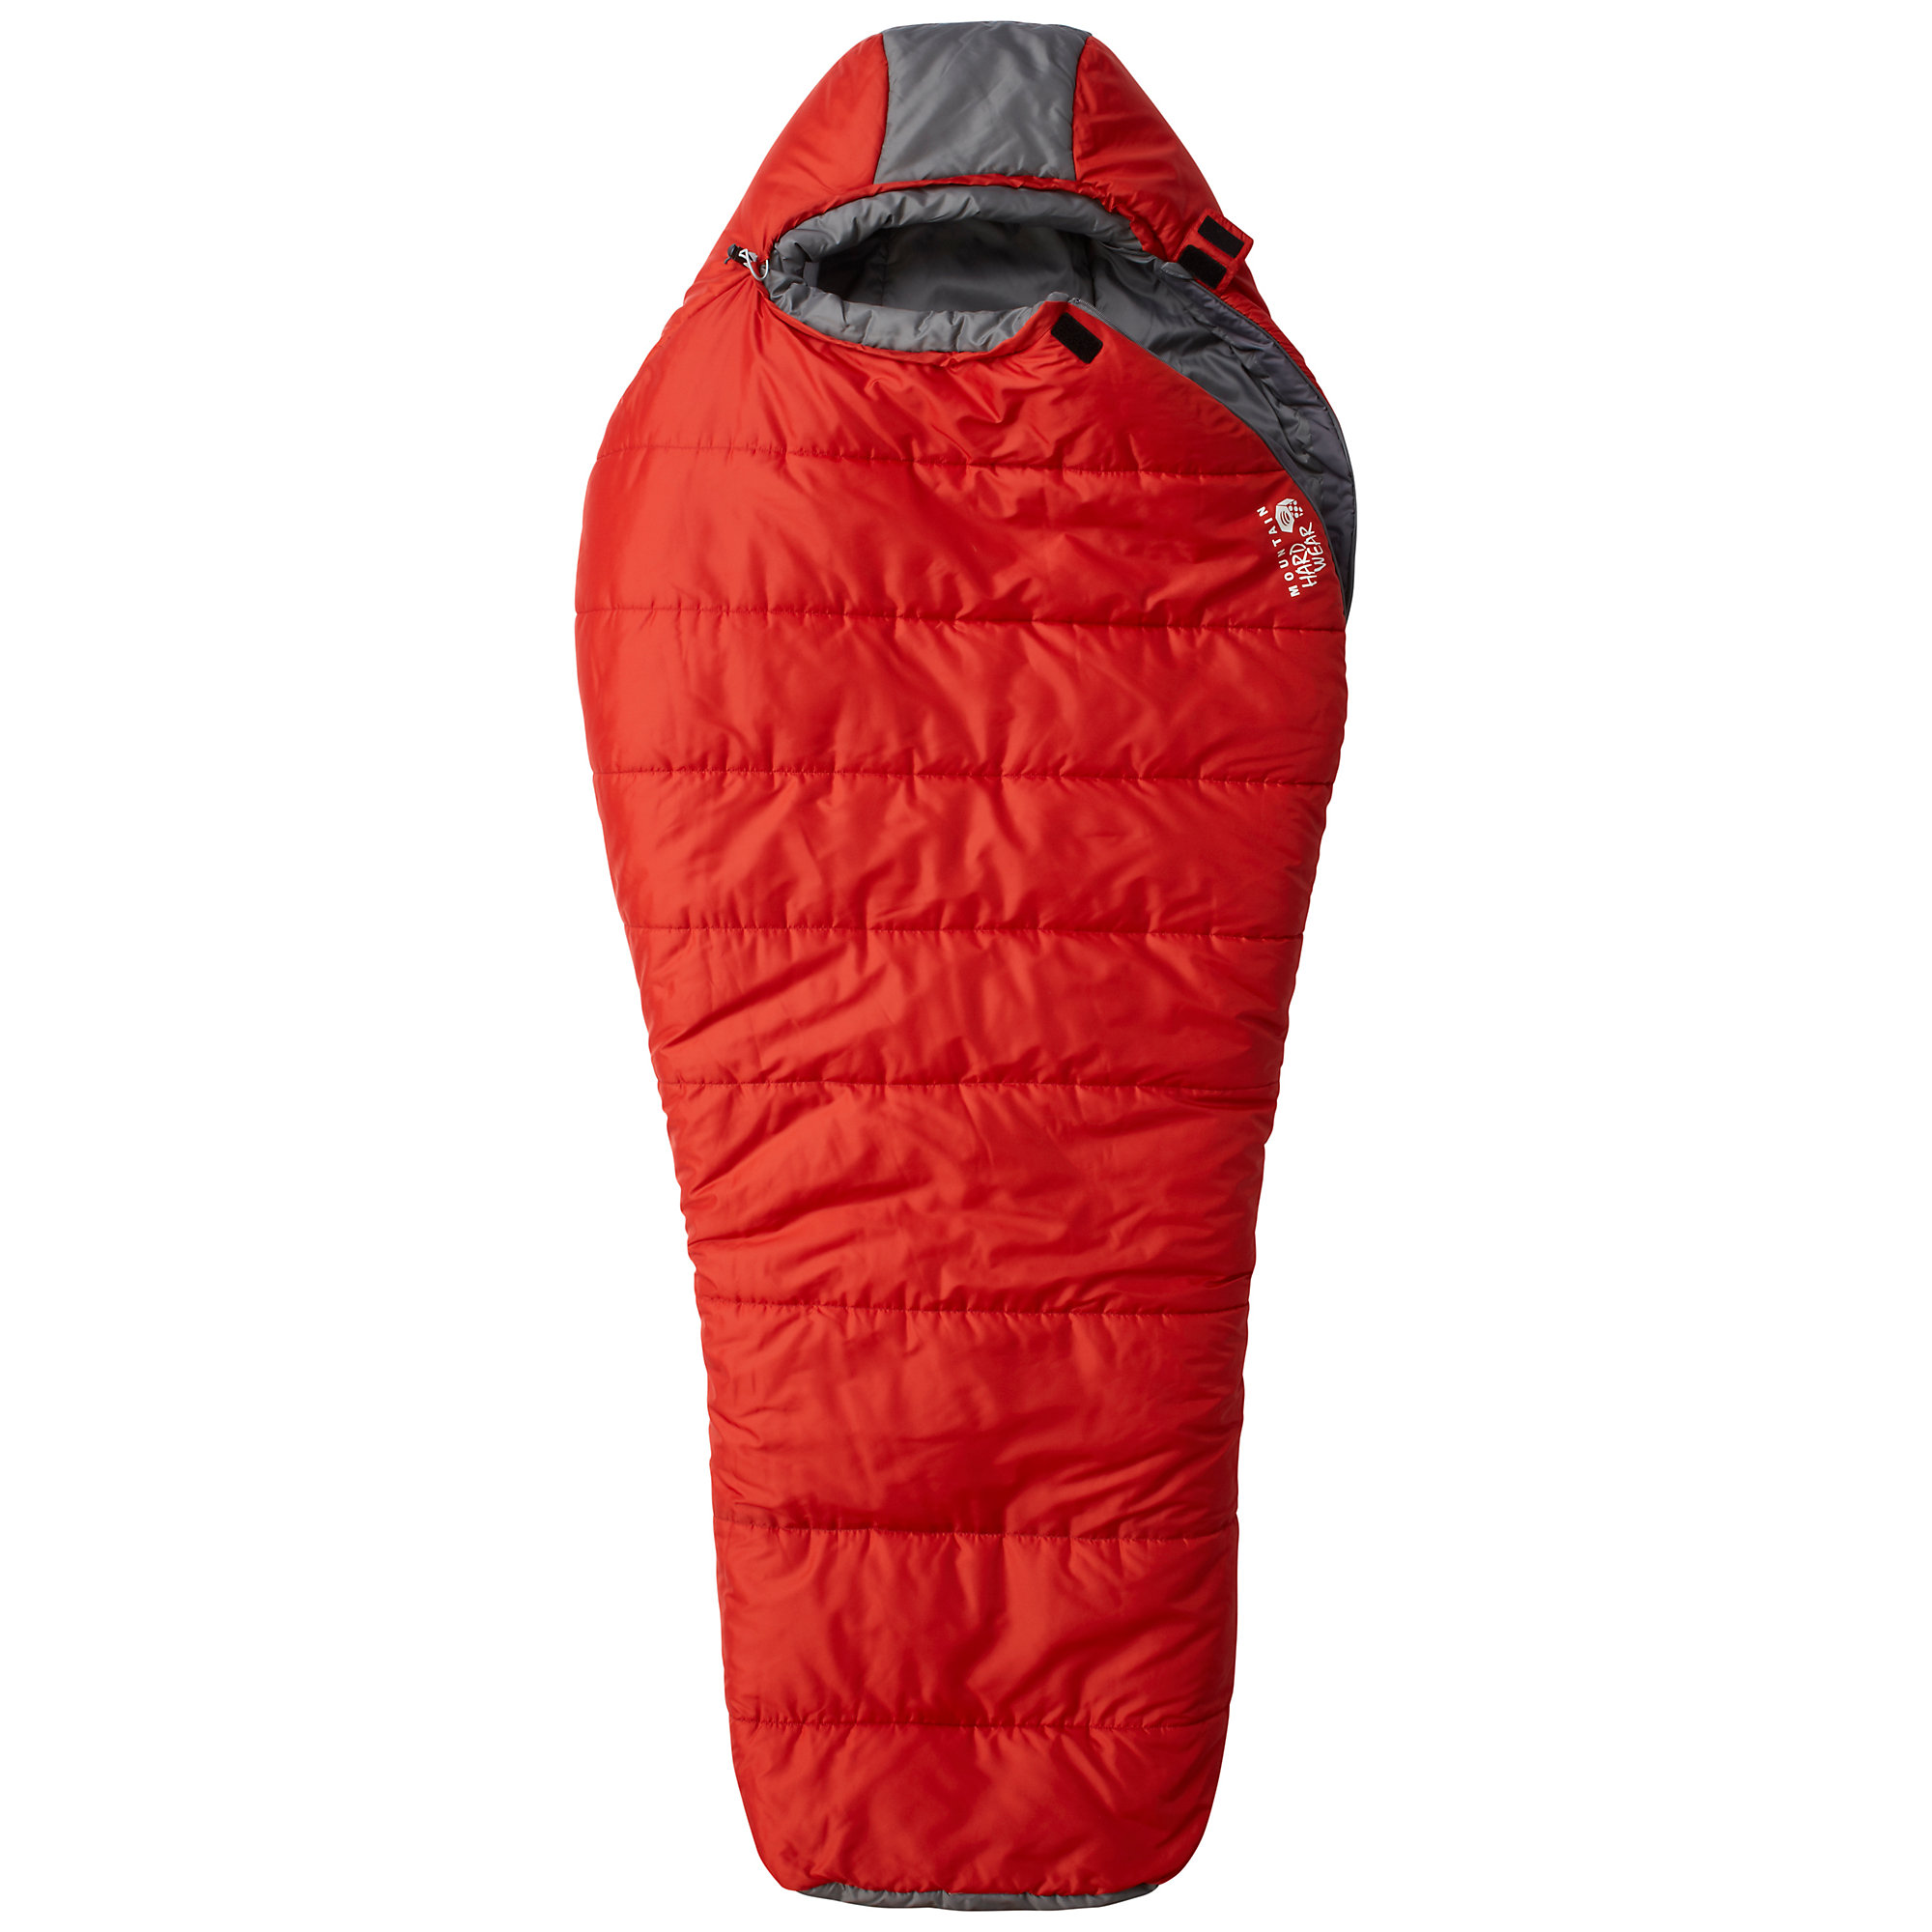 photo: Mountain Hardwear Bozeman Torch 0 3-season synthetic sleeping bag